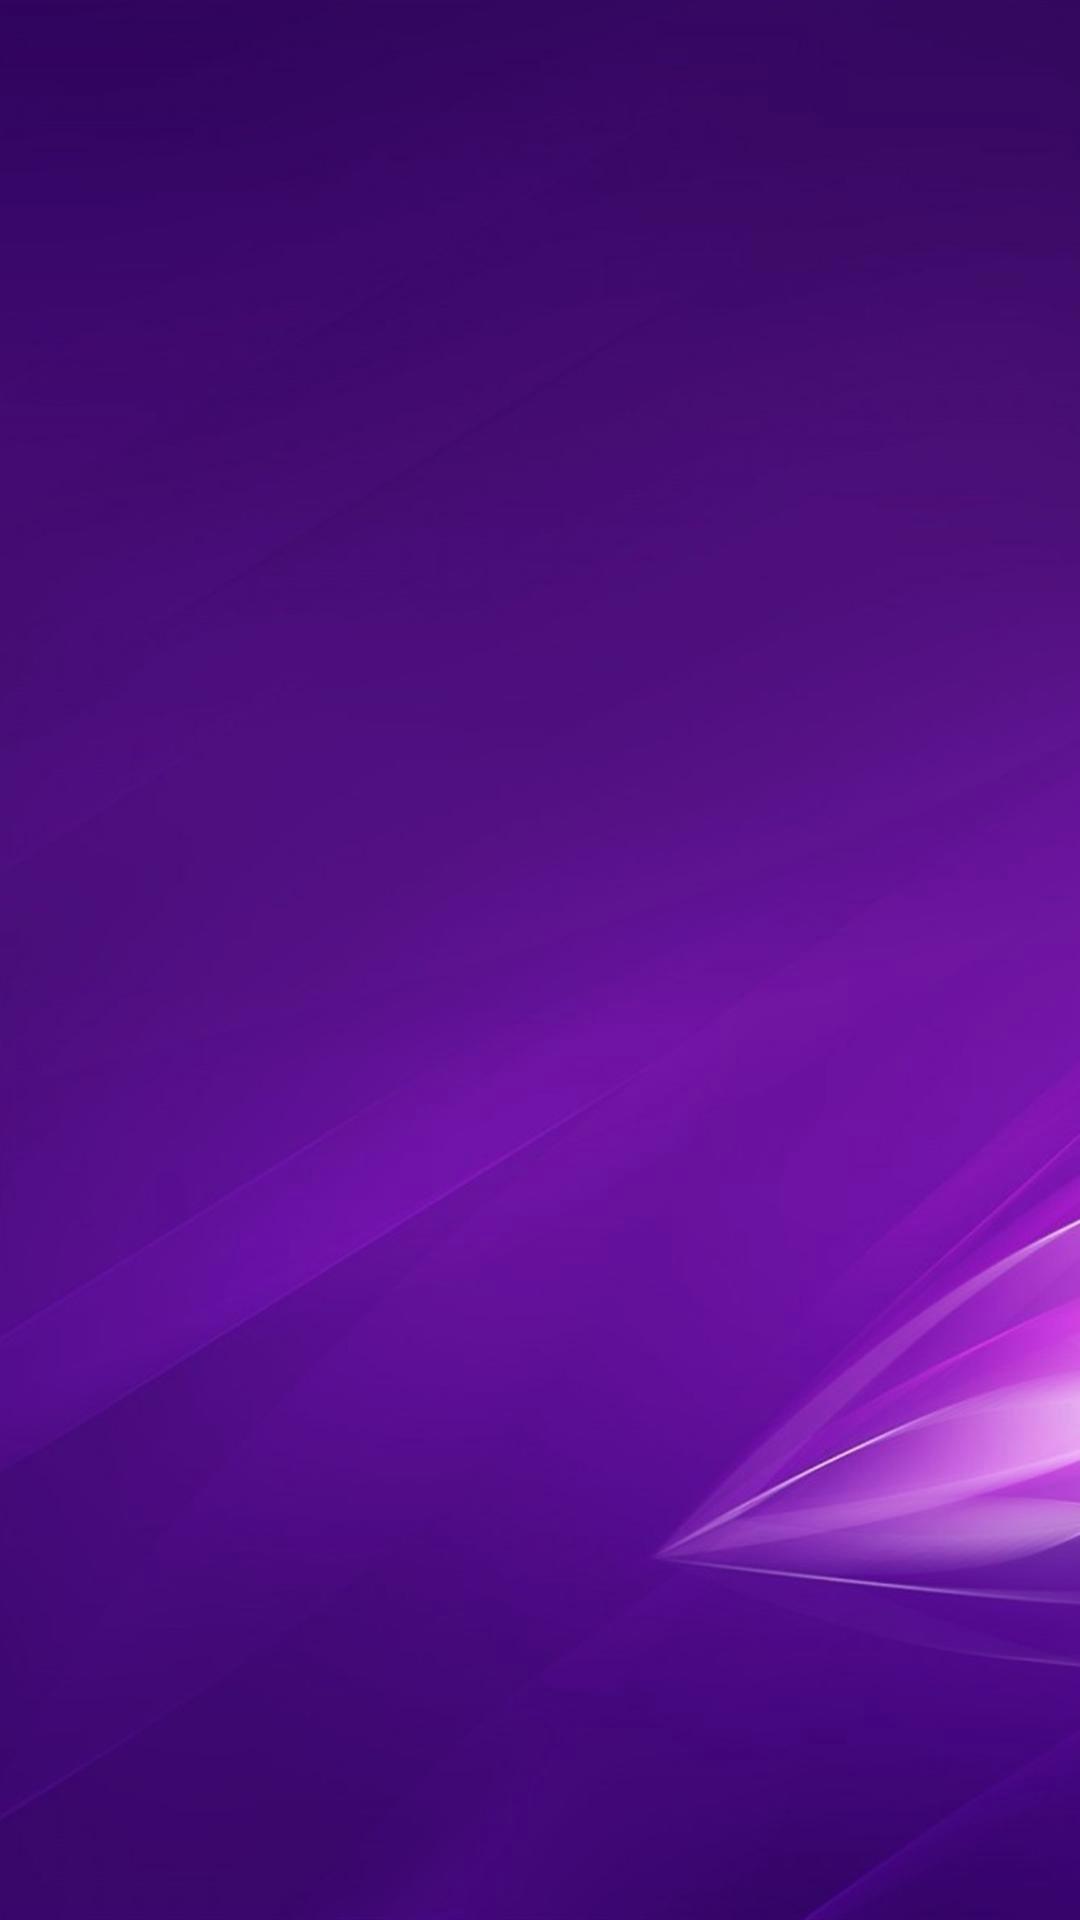 … ilikewallpaper_com Purple Wallpaper For Iphone purple wallpaper for  iphone HD5 …